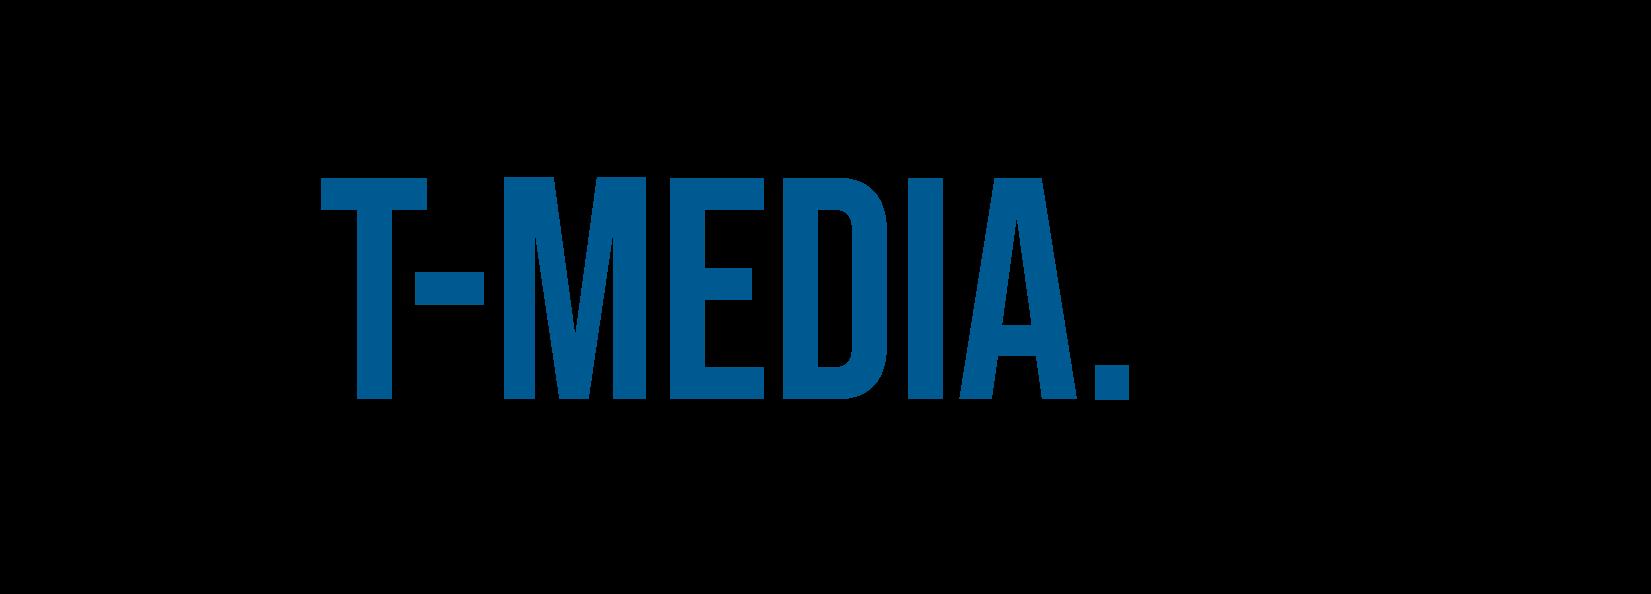 Т-медиа